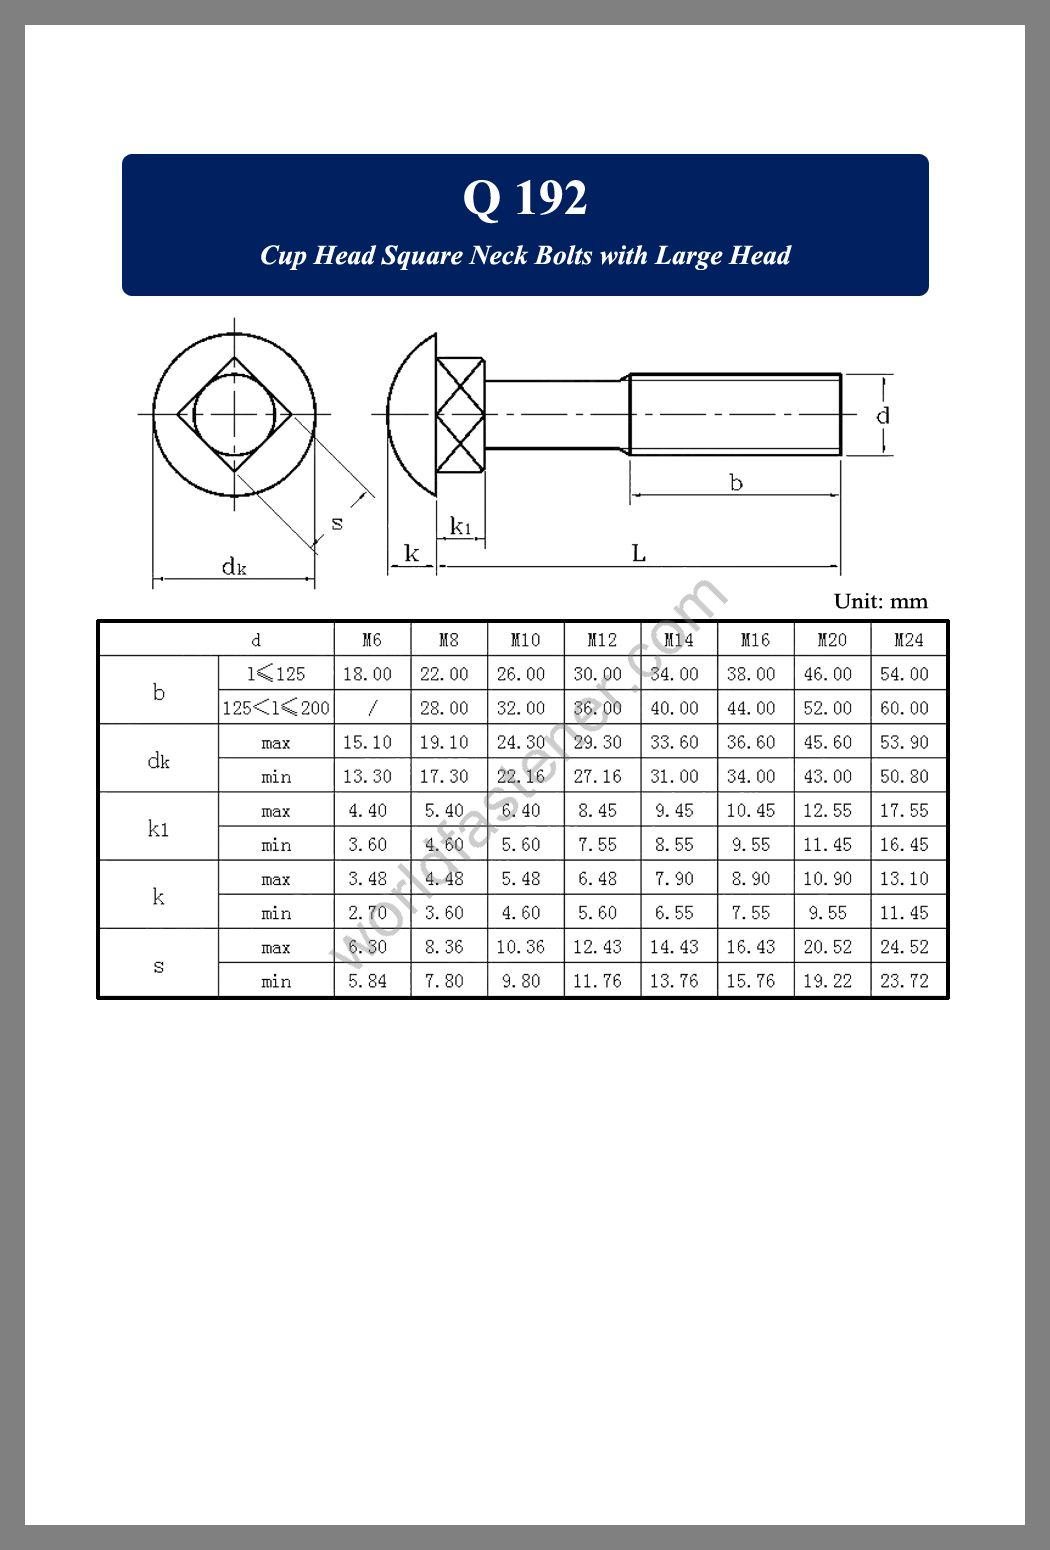 Q 192, Q 192 Cup Head Bolts, fastener, screw, bolt